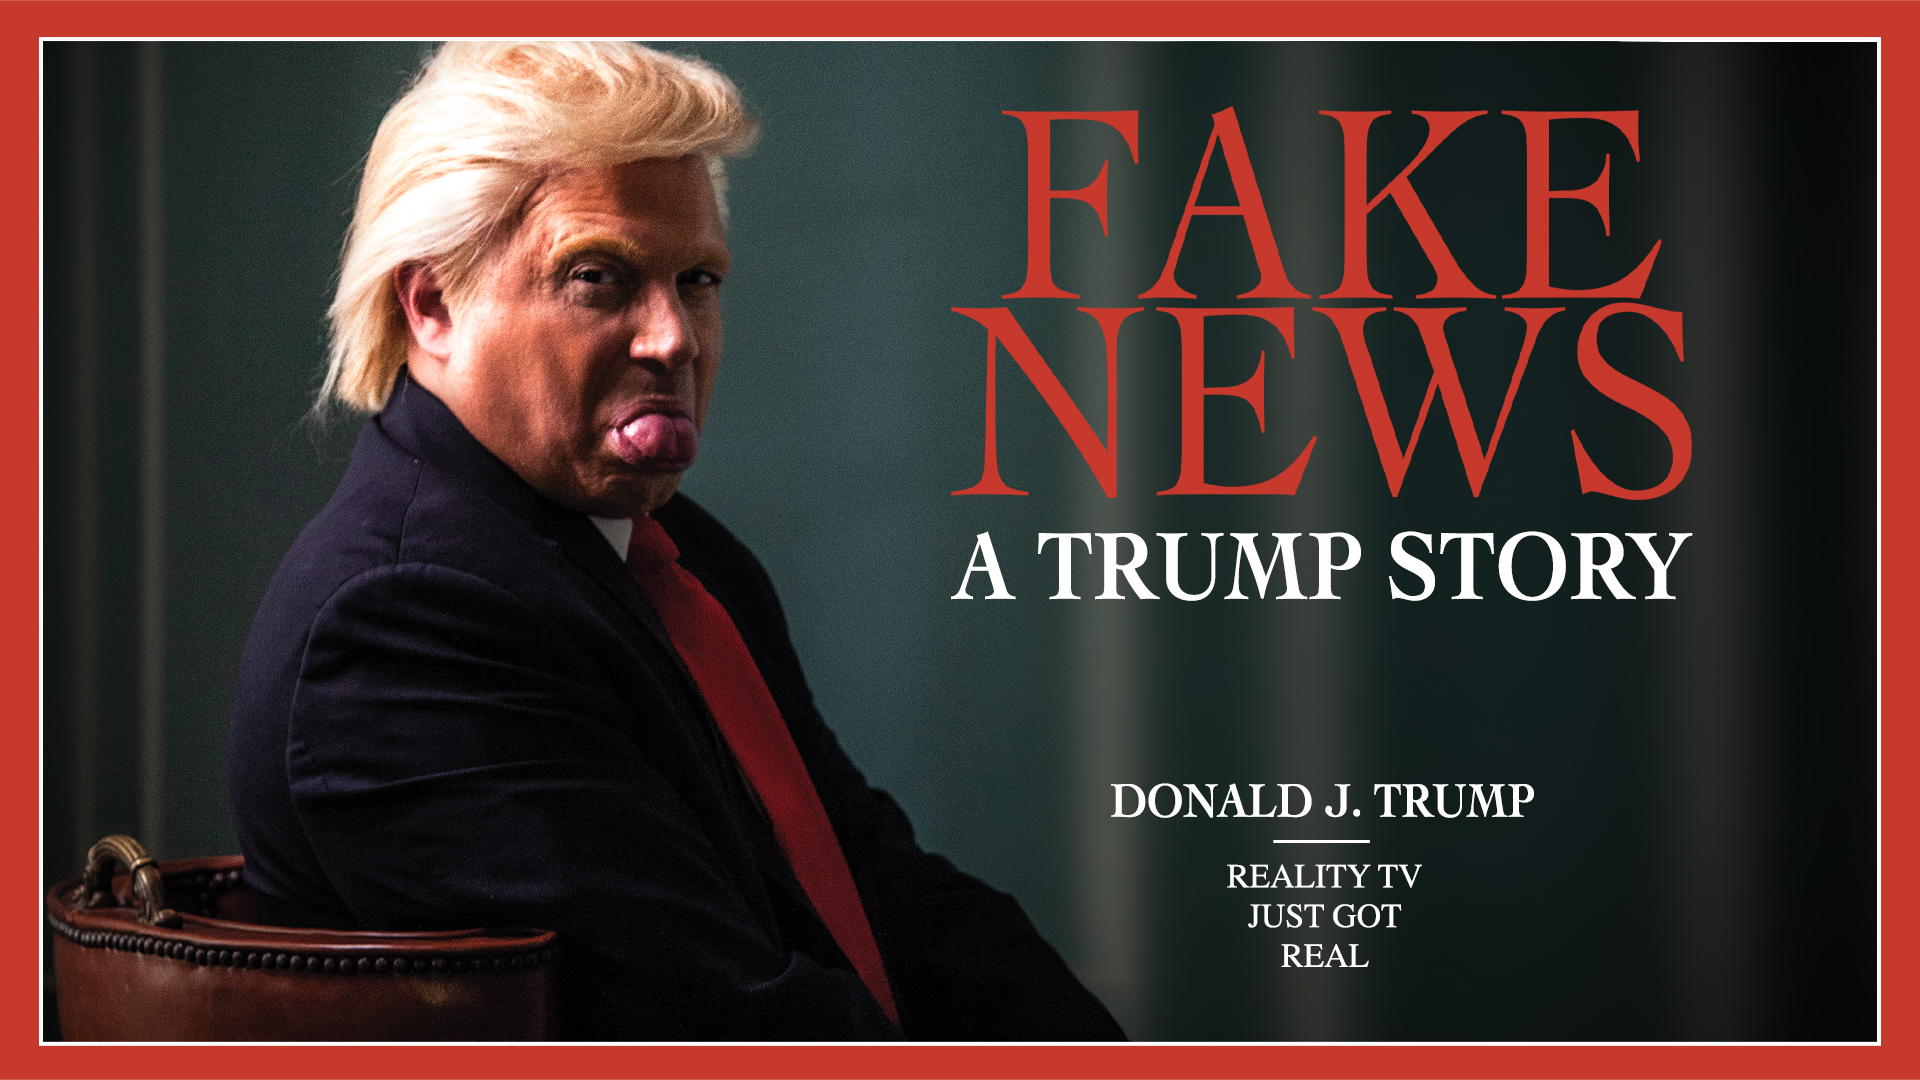 Fake News: A Trump Story